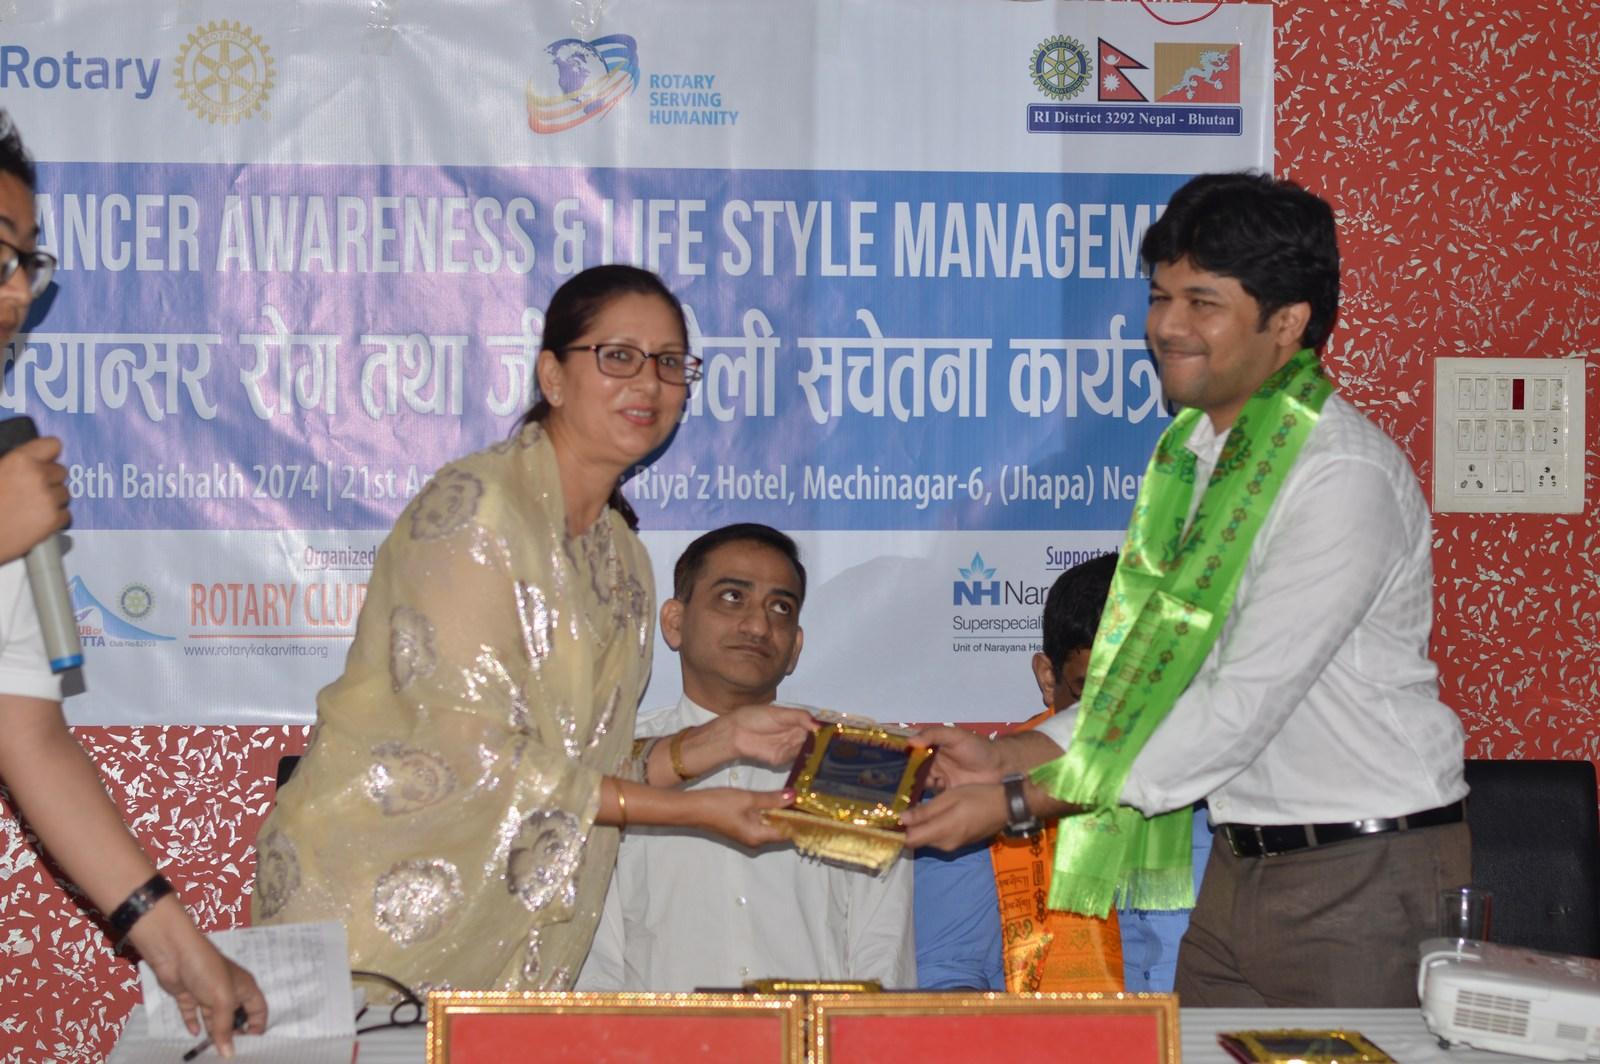 Cancer-Awareness-Life-Style-Management-Interaction-Program-2016-17-Rotary-Club-of-Kakarvitta-100